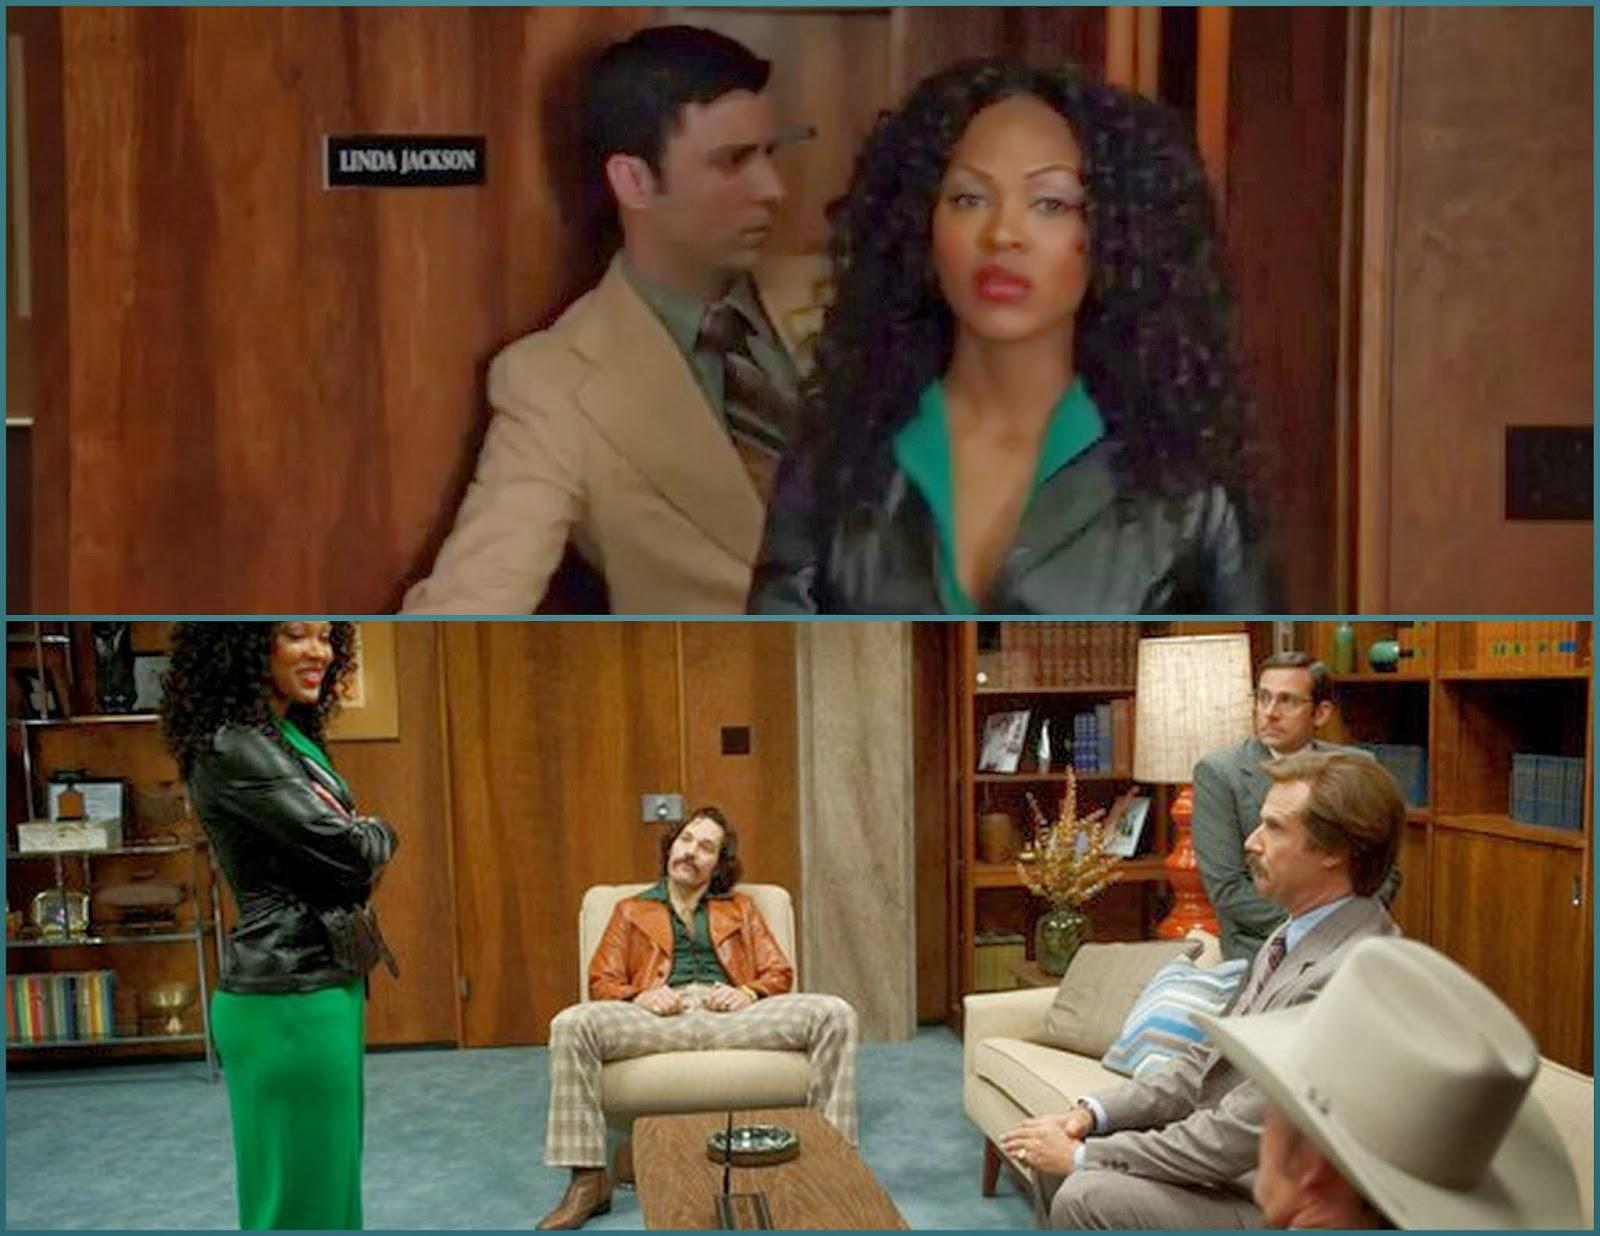 anchorman 2 trailer latino dating